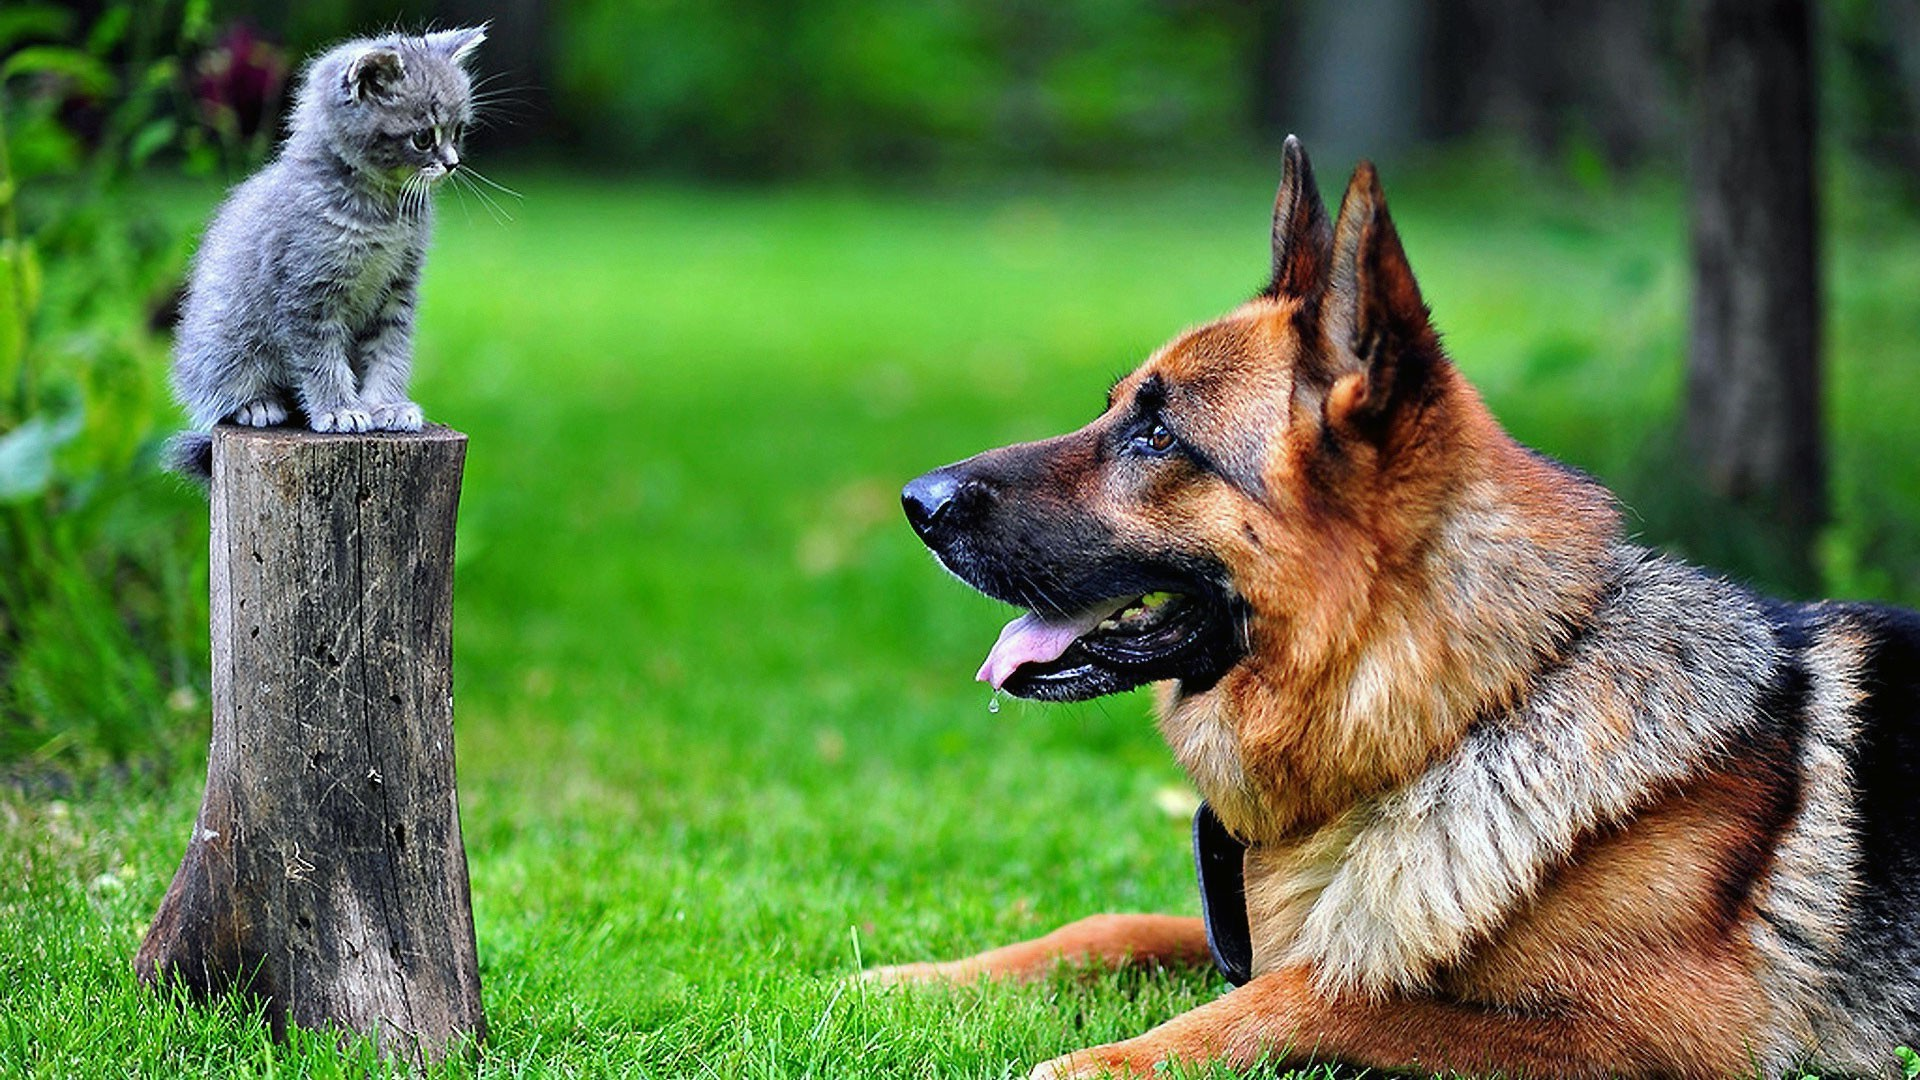 dog, Kittens, German Shepherd, Animals, Cat, Tree Stump Wallpapers HD /  Desktop and Mobile Backgrounds